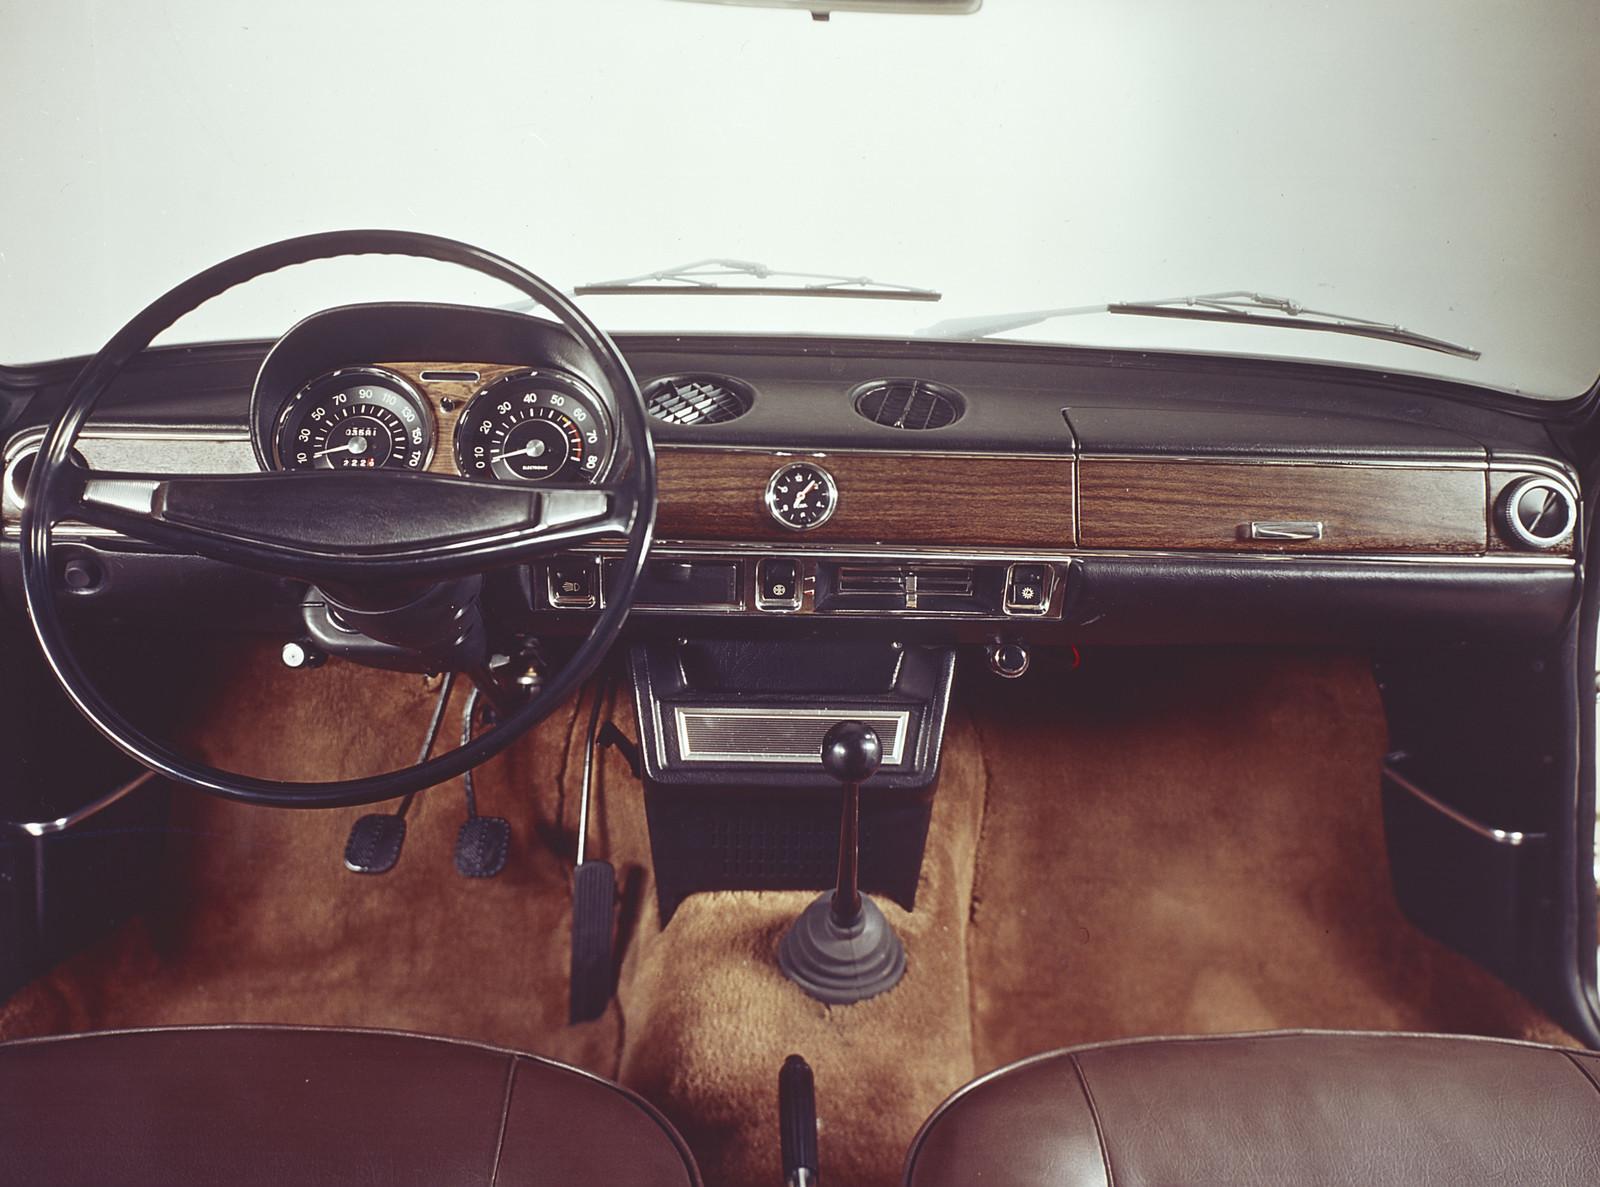 Foto de Motor SEAT 1430 - fotos históricas (6/49)